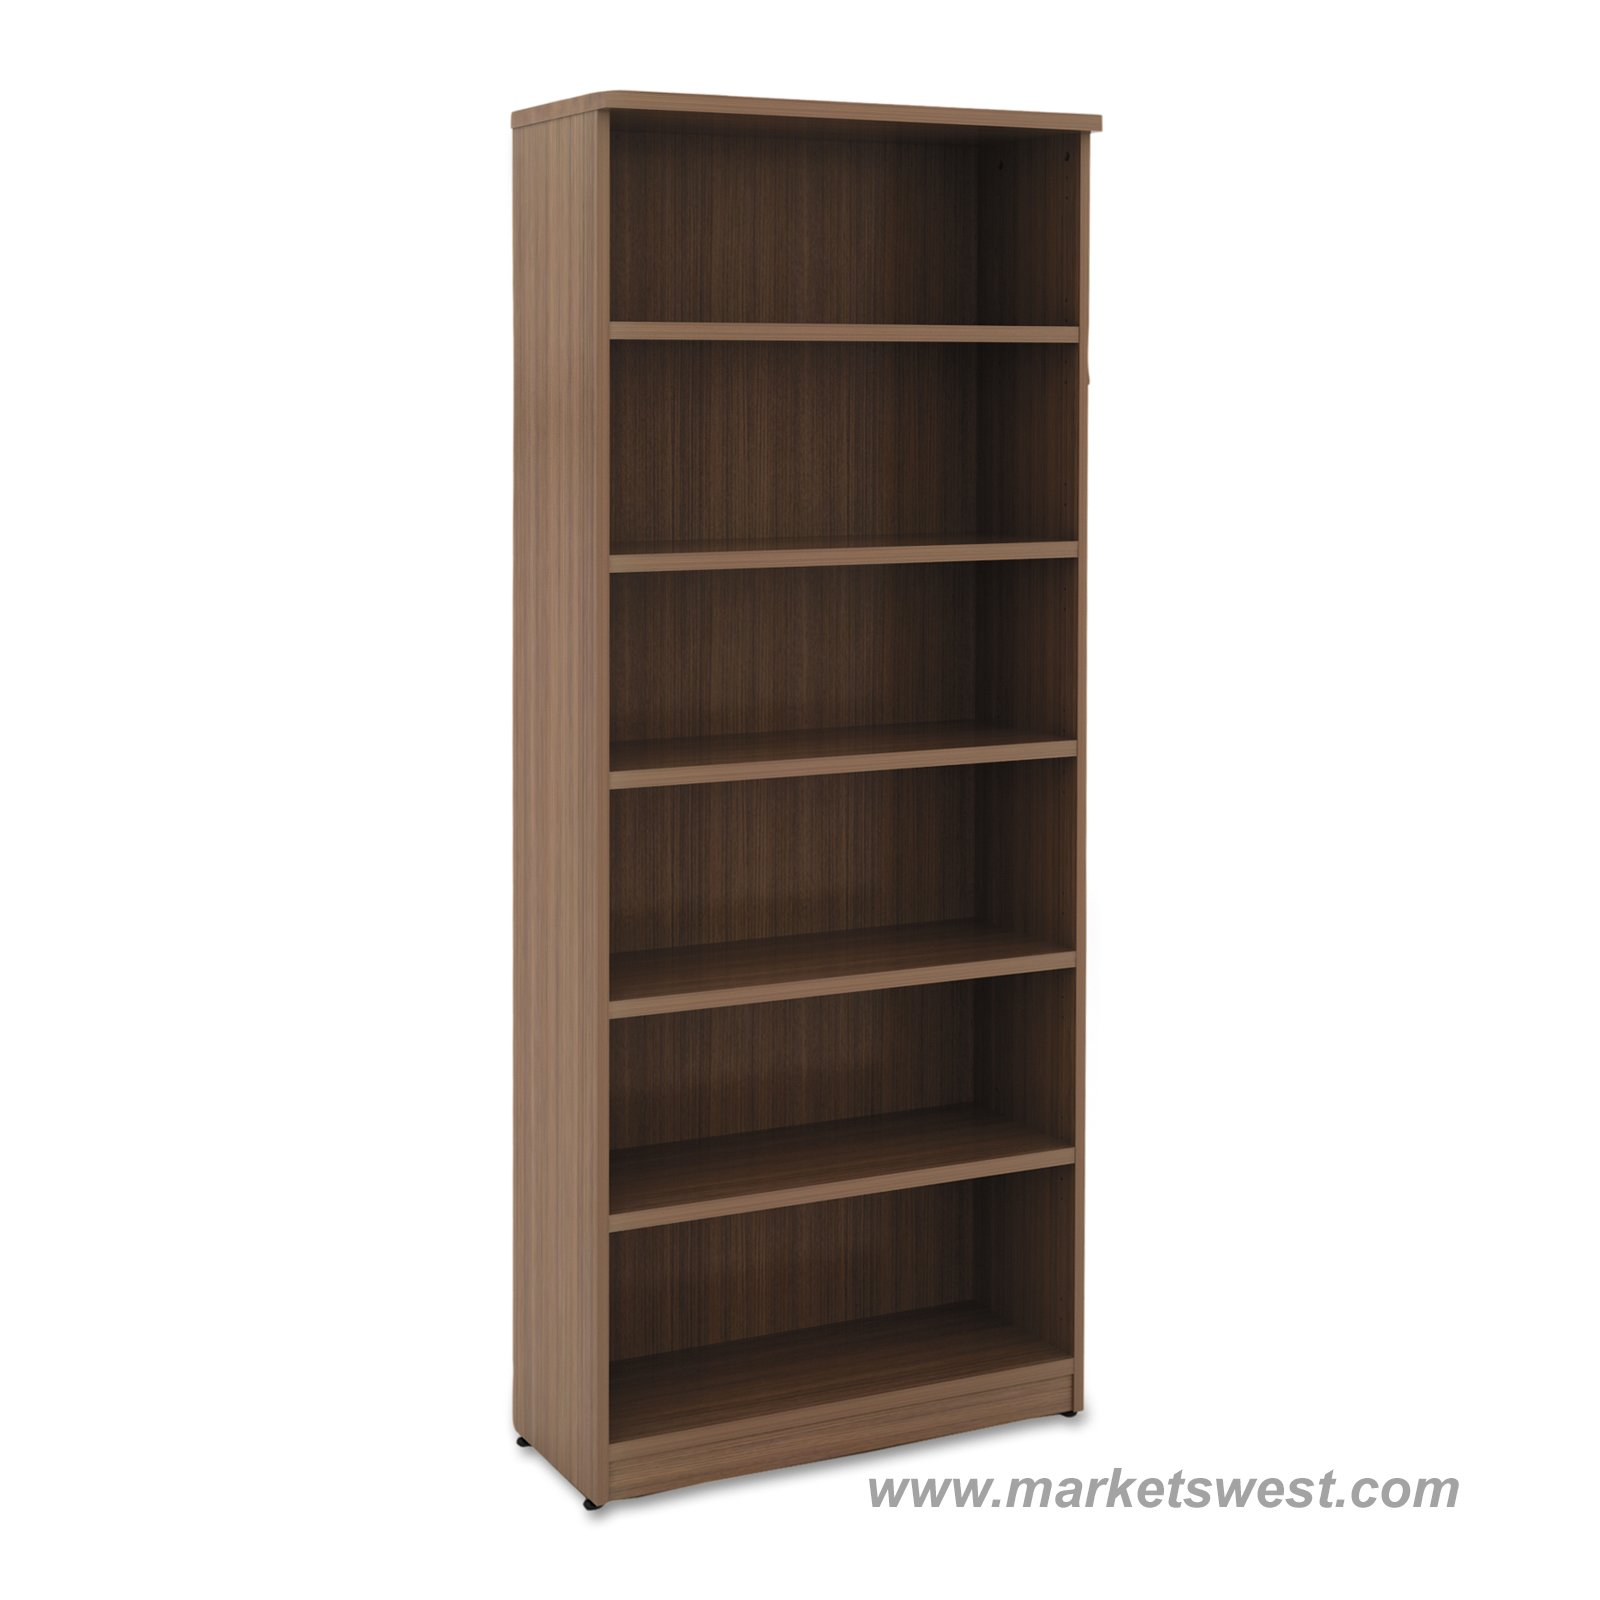 Alera 6 Shelf Laminate Bookcase